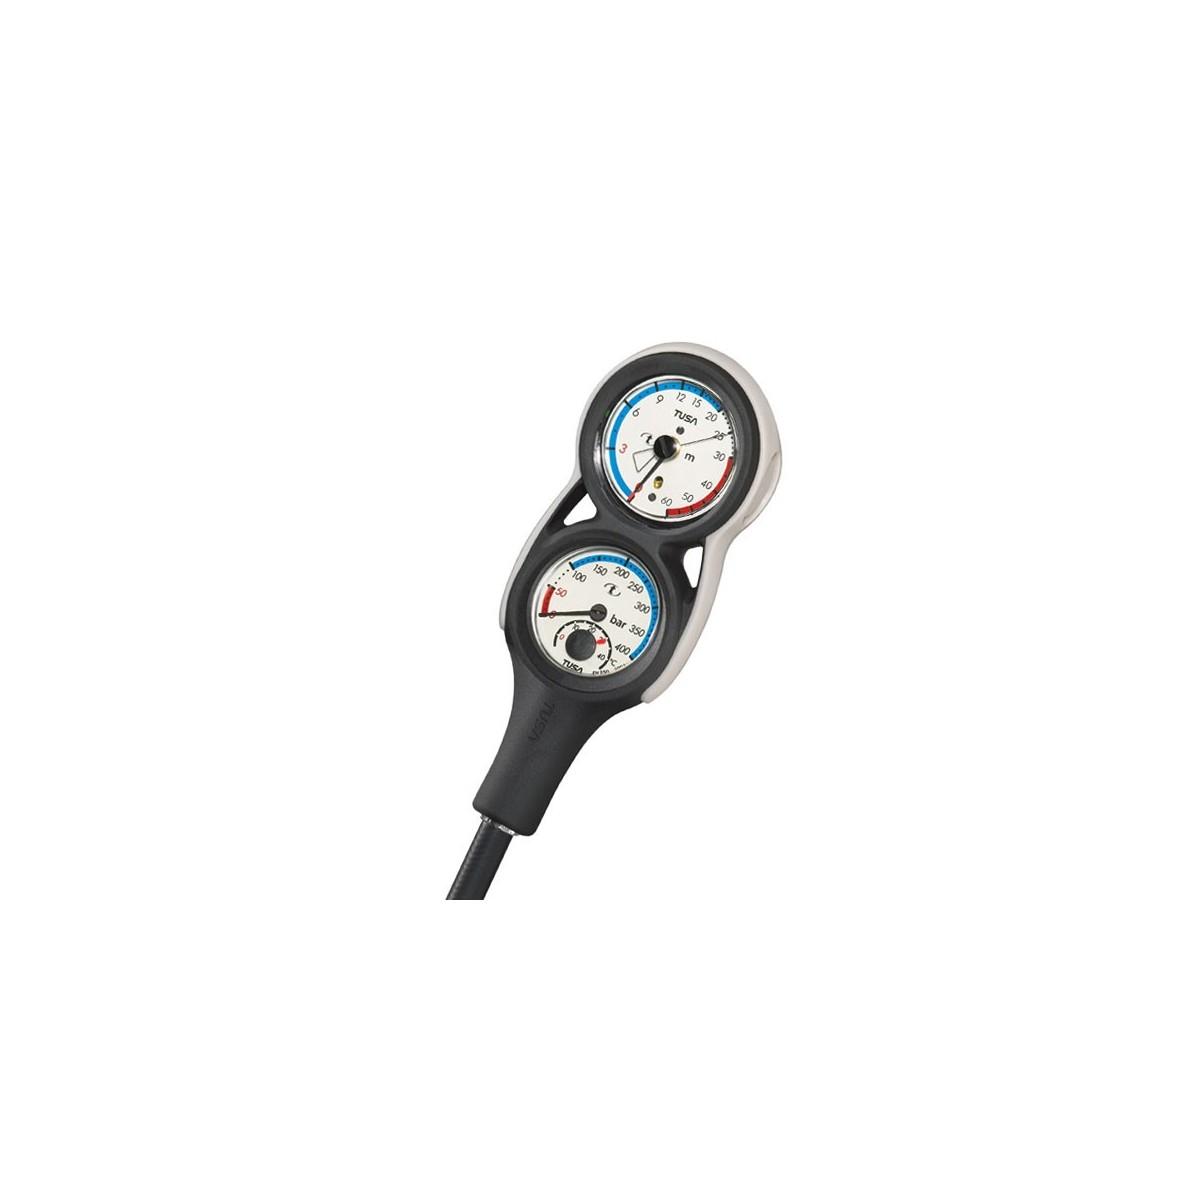 Tusa Platina 2 gauge Analog console